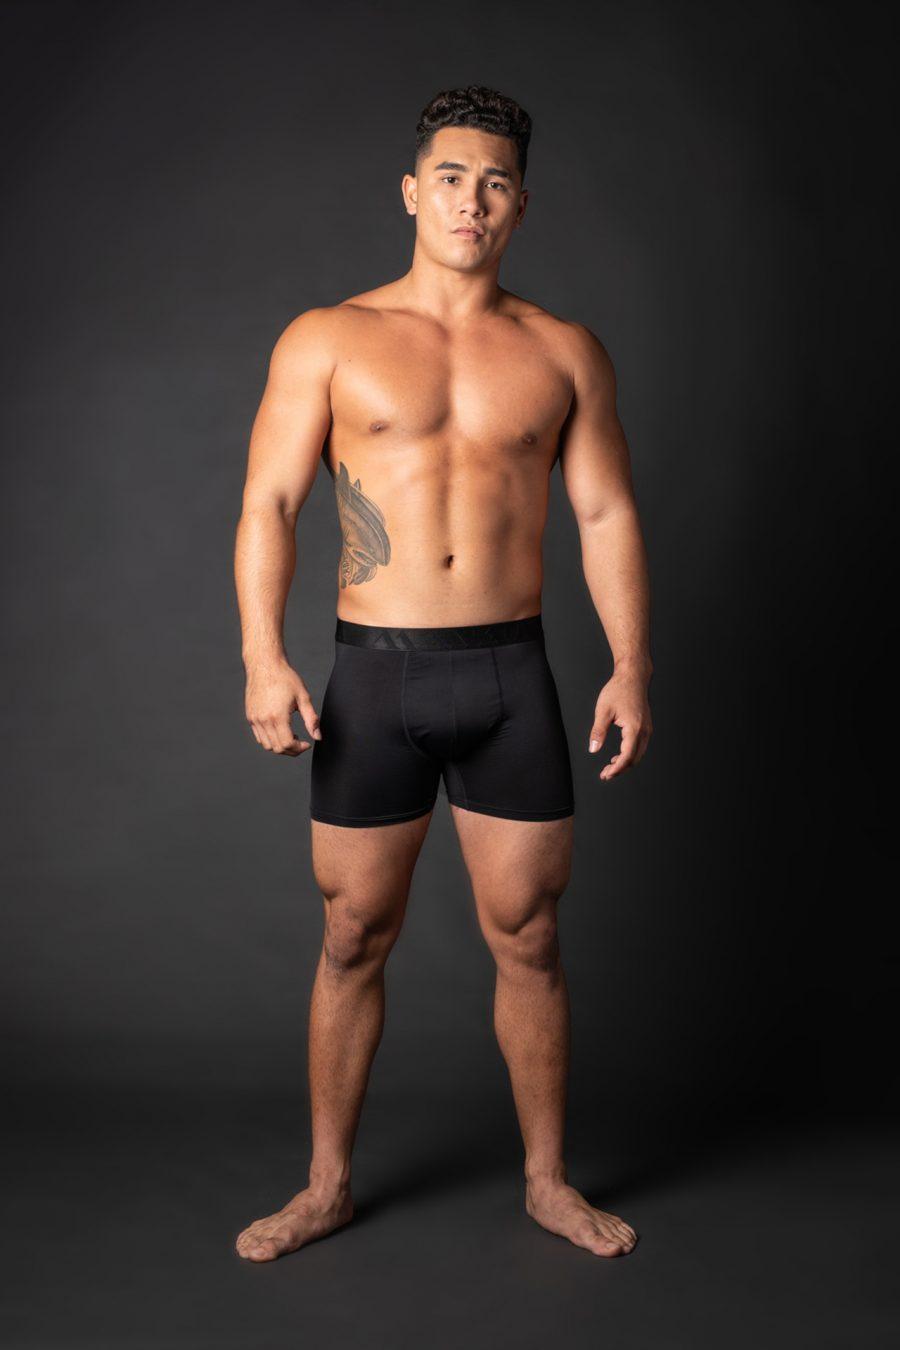 Male model wearing Uwila Midway Briefs in Black Solid Pattern - Front View